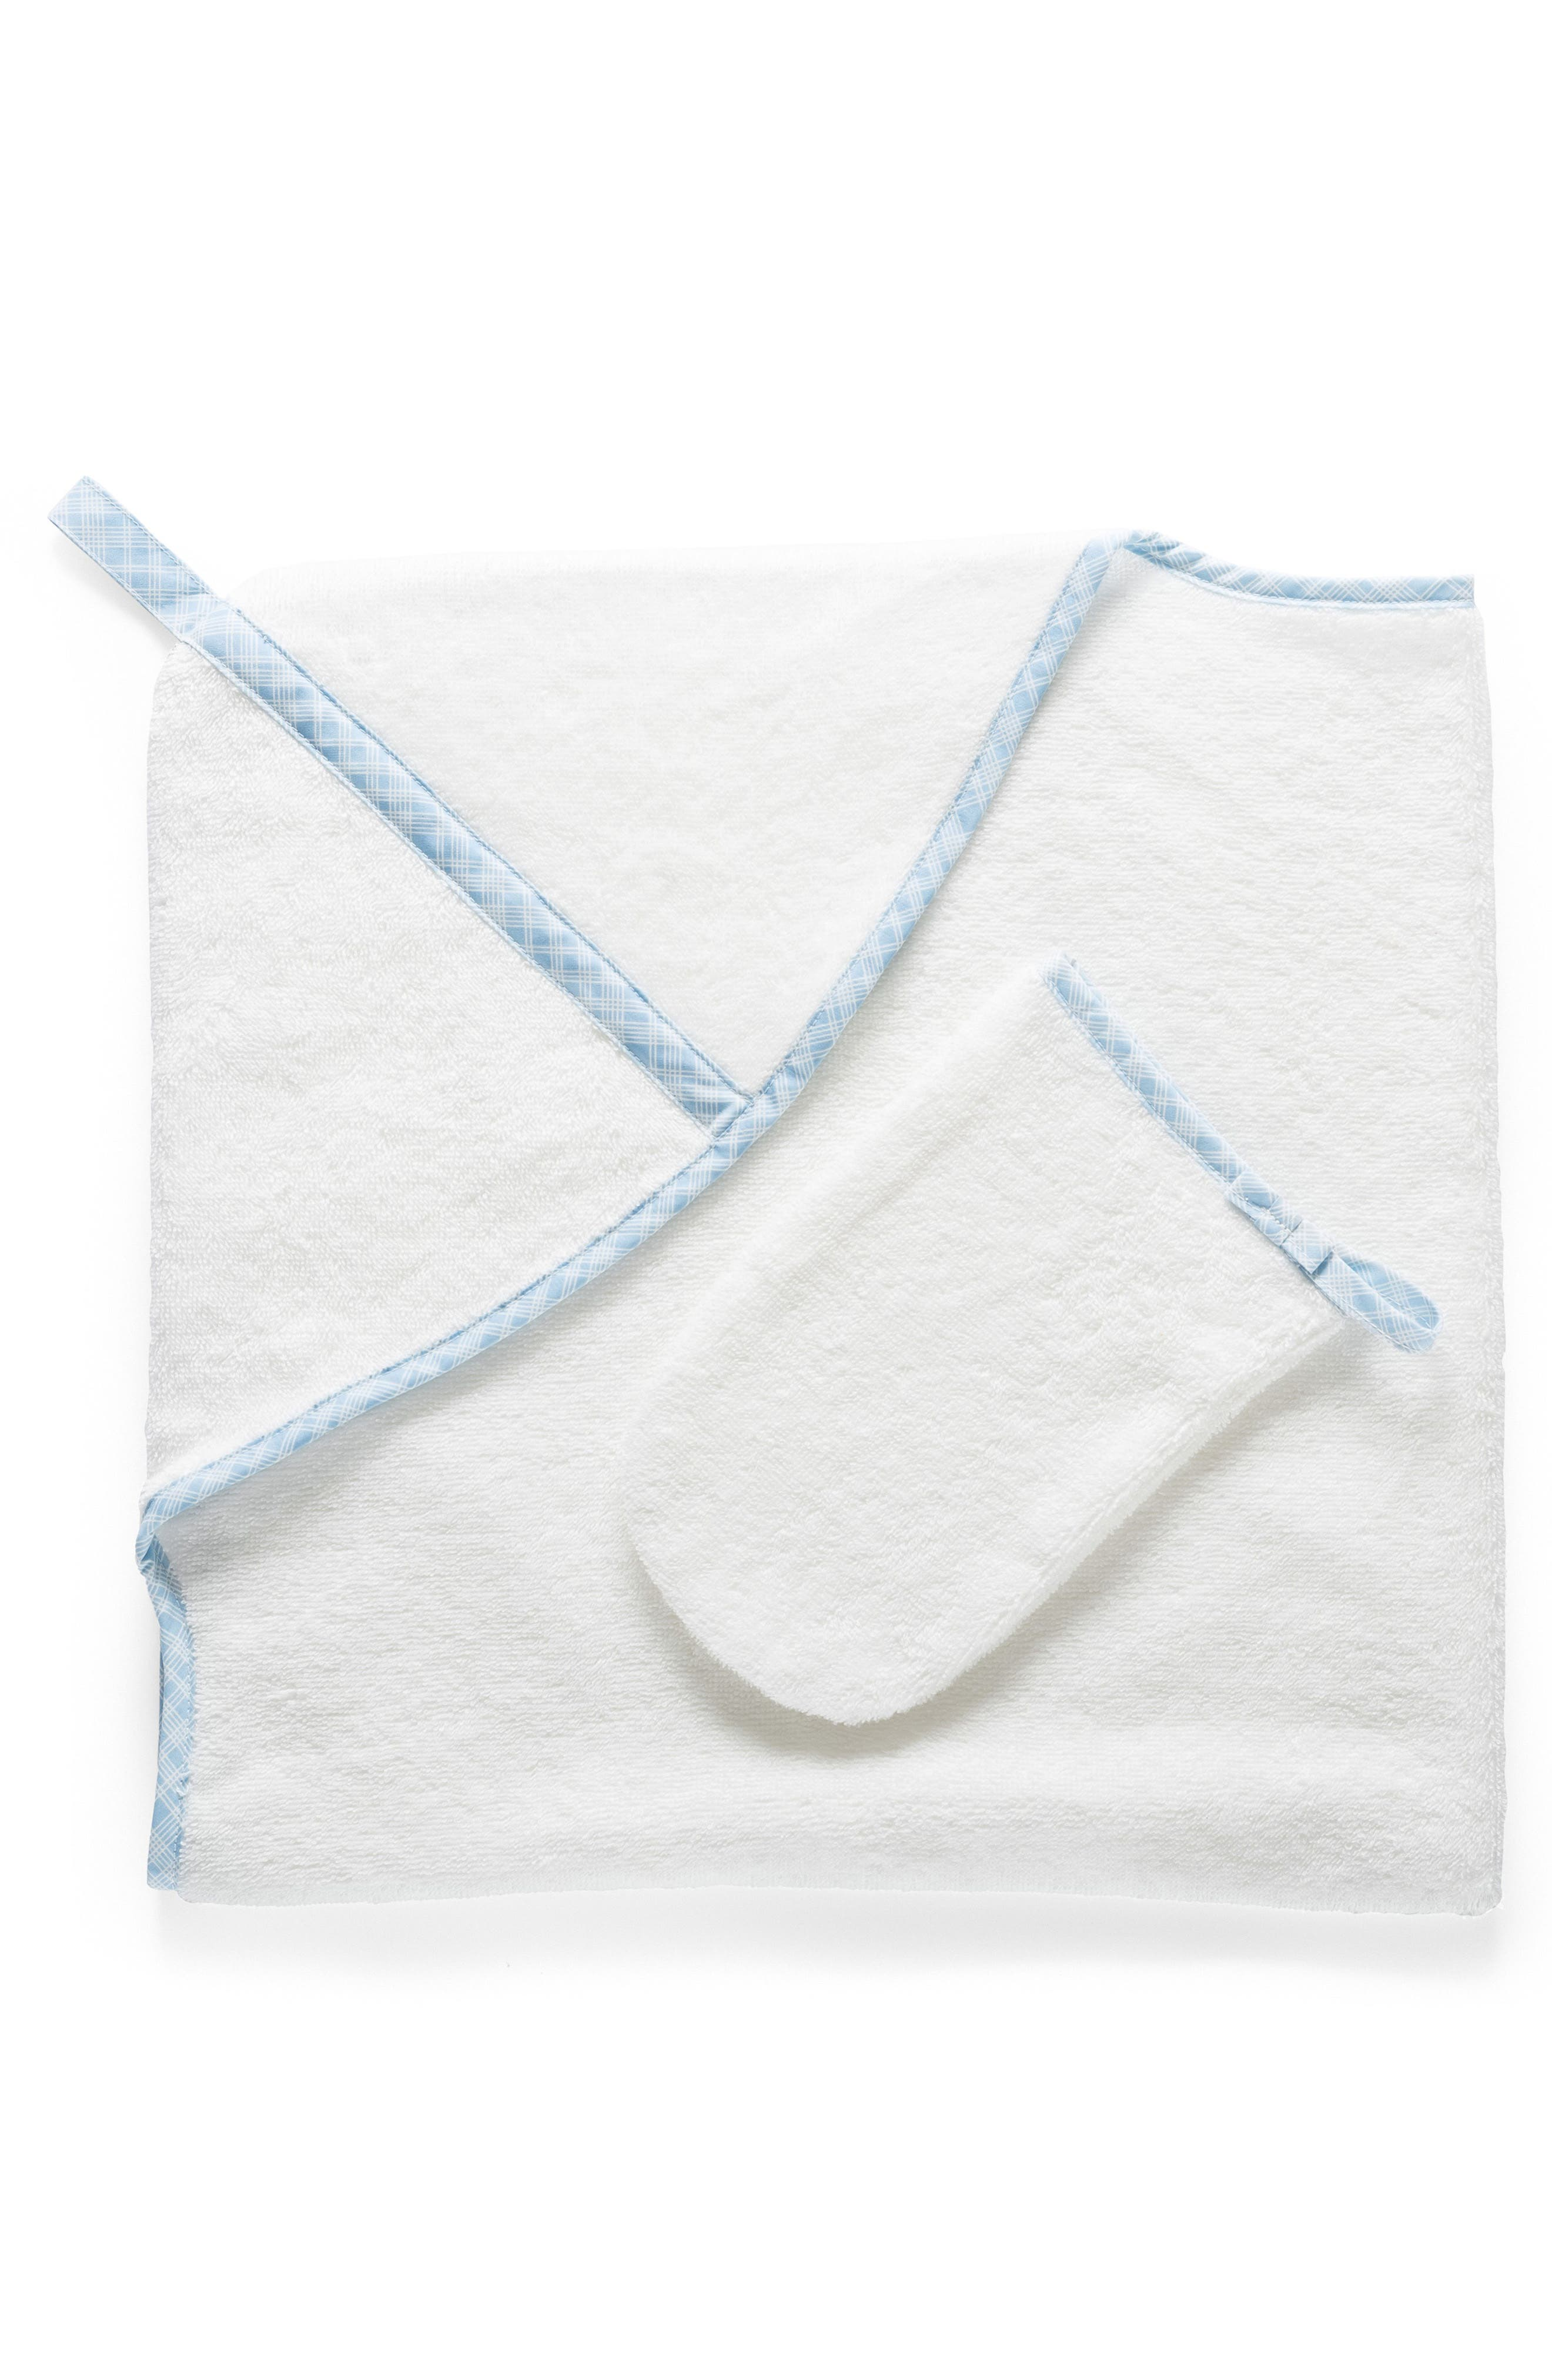 Hooded Towel & Bath Mitt Set,                             Main thumbnail 1, color,